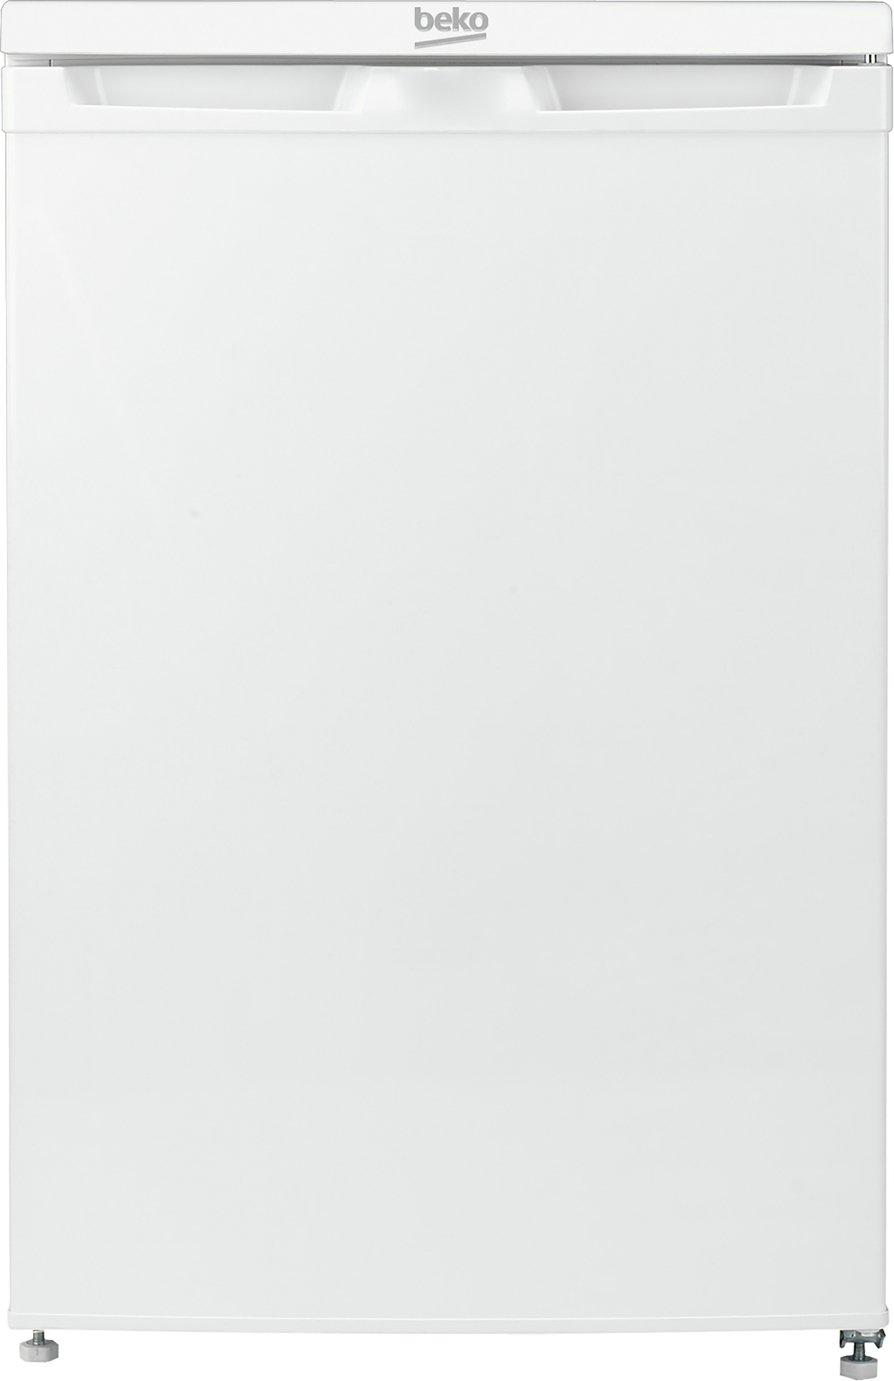 Beko UFF584APW Under Counter Freezer - White